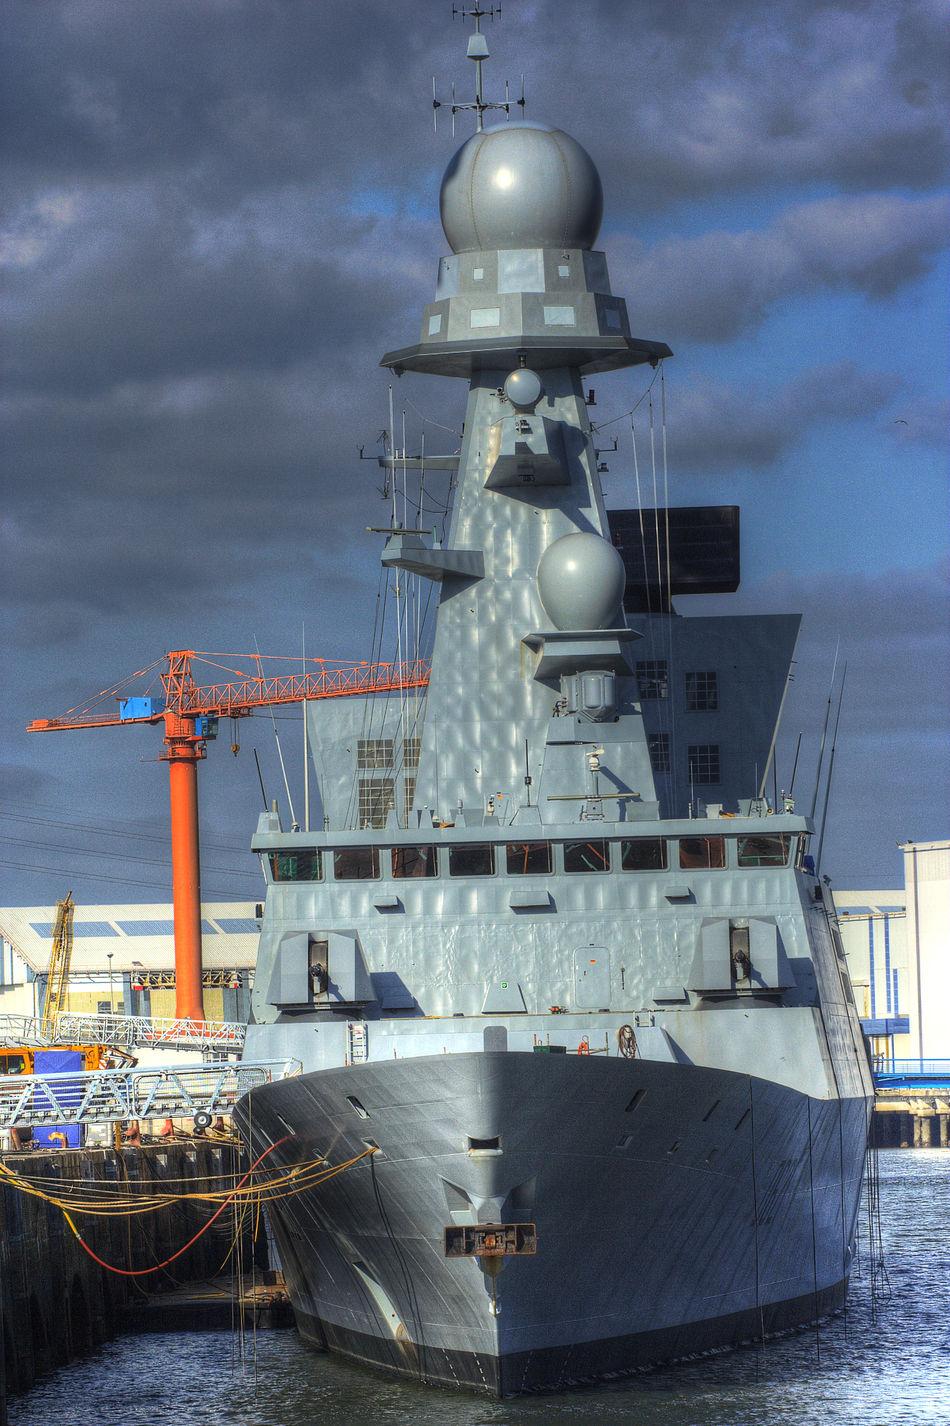 Arsenal Lorient Boat Bretagne Crane - Construction Machinery Fregate Harbor Industry Lorient Militaire Morbihan Navire Water